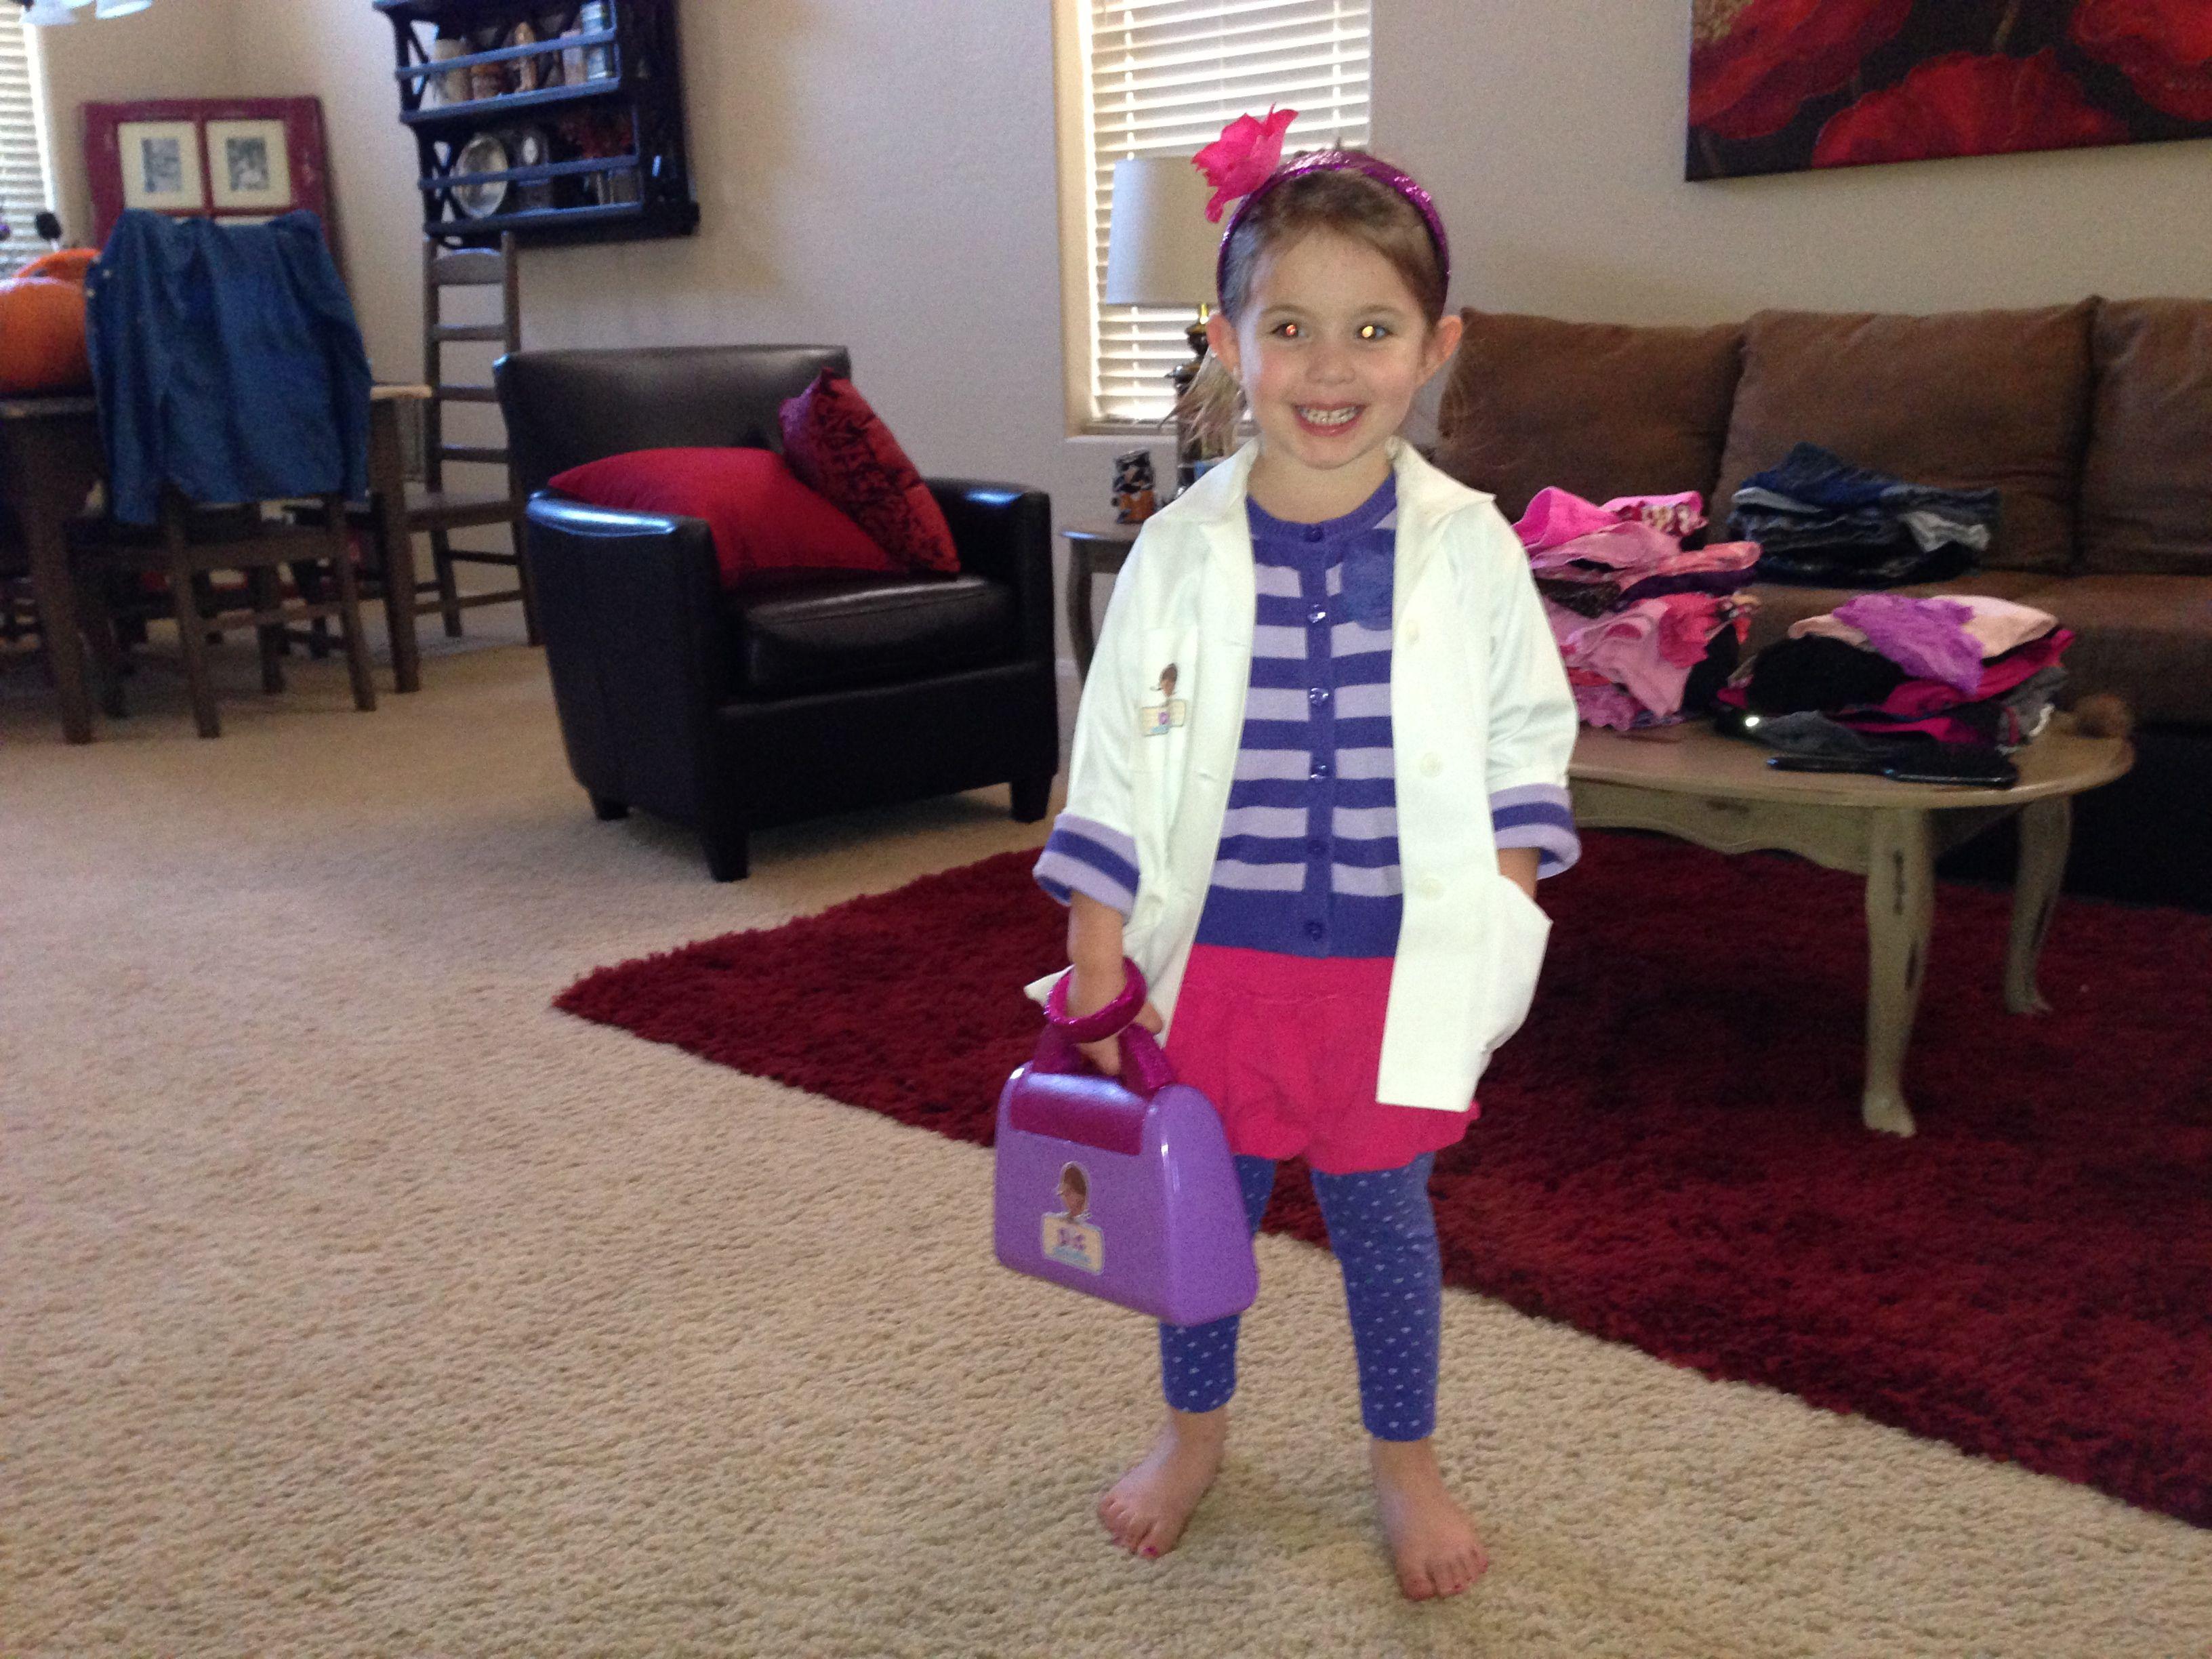 DIY Doc McStuffins costume | Diy | Pinterest | Doc mcstuffins ...